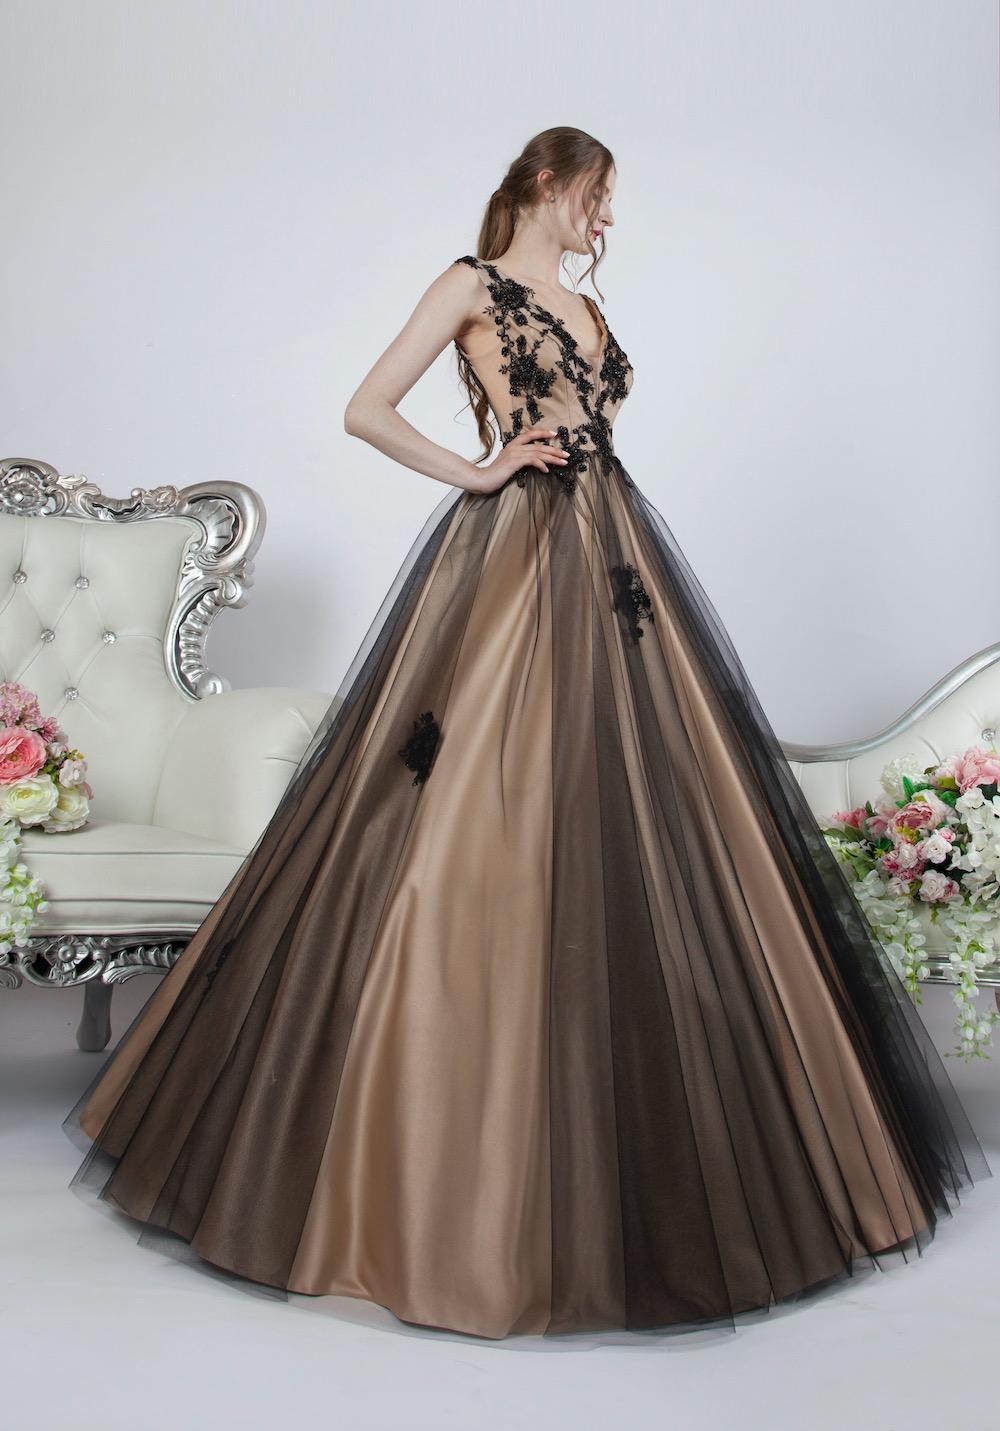 Robe de gala type princesse avec grande jupe